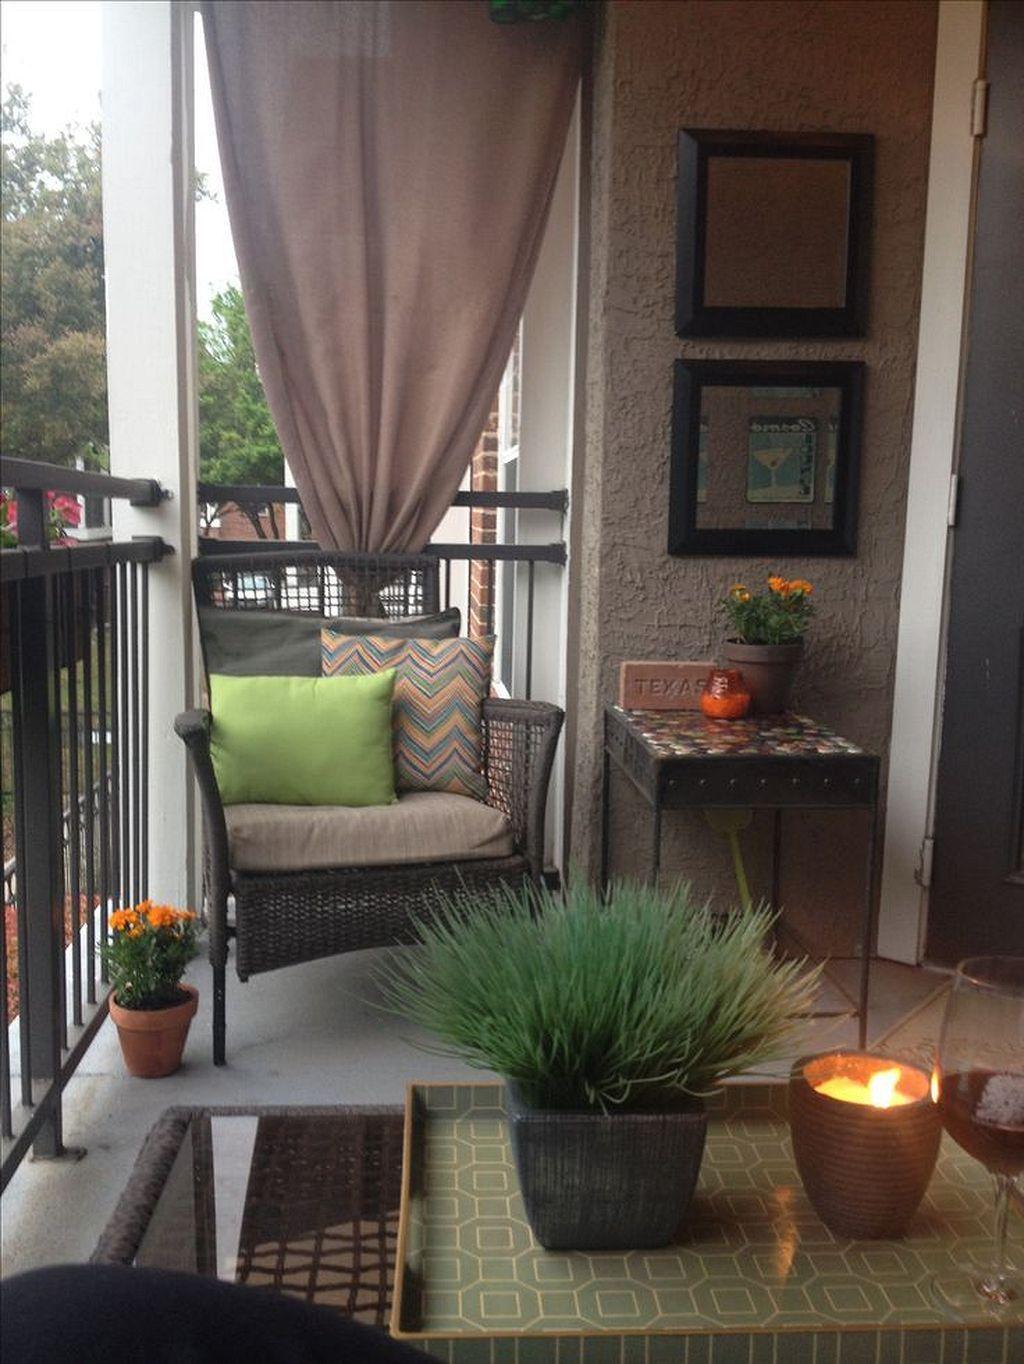 60 creative apartment patio on a budget ideas 49 on diy home decor on a budget apartment ideas id=92393